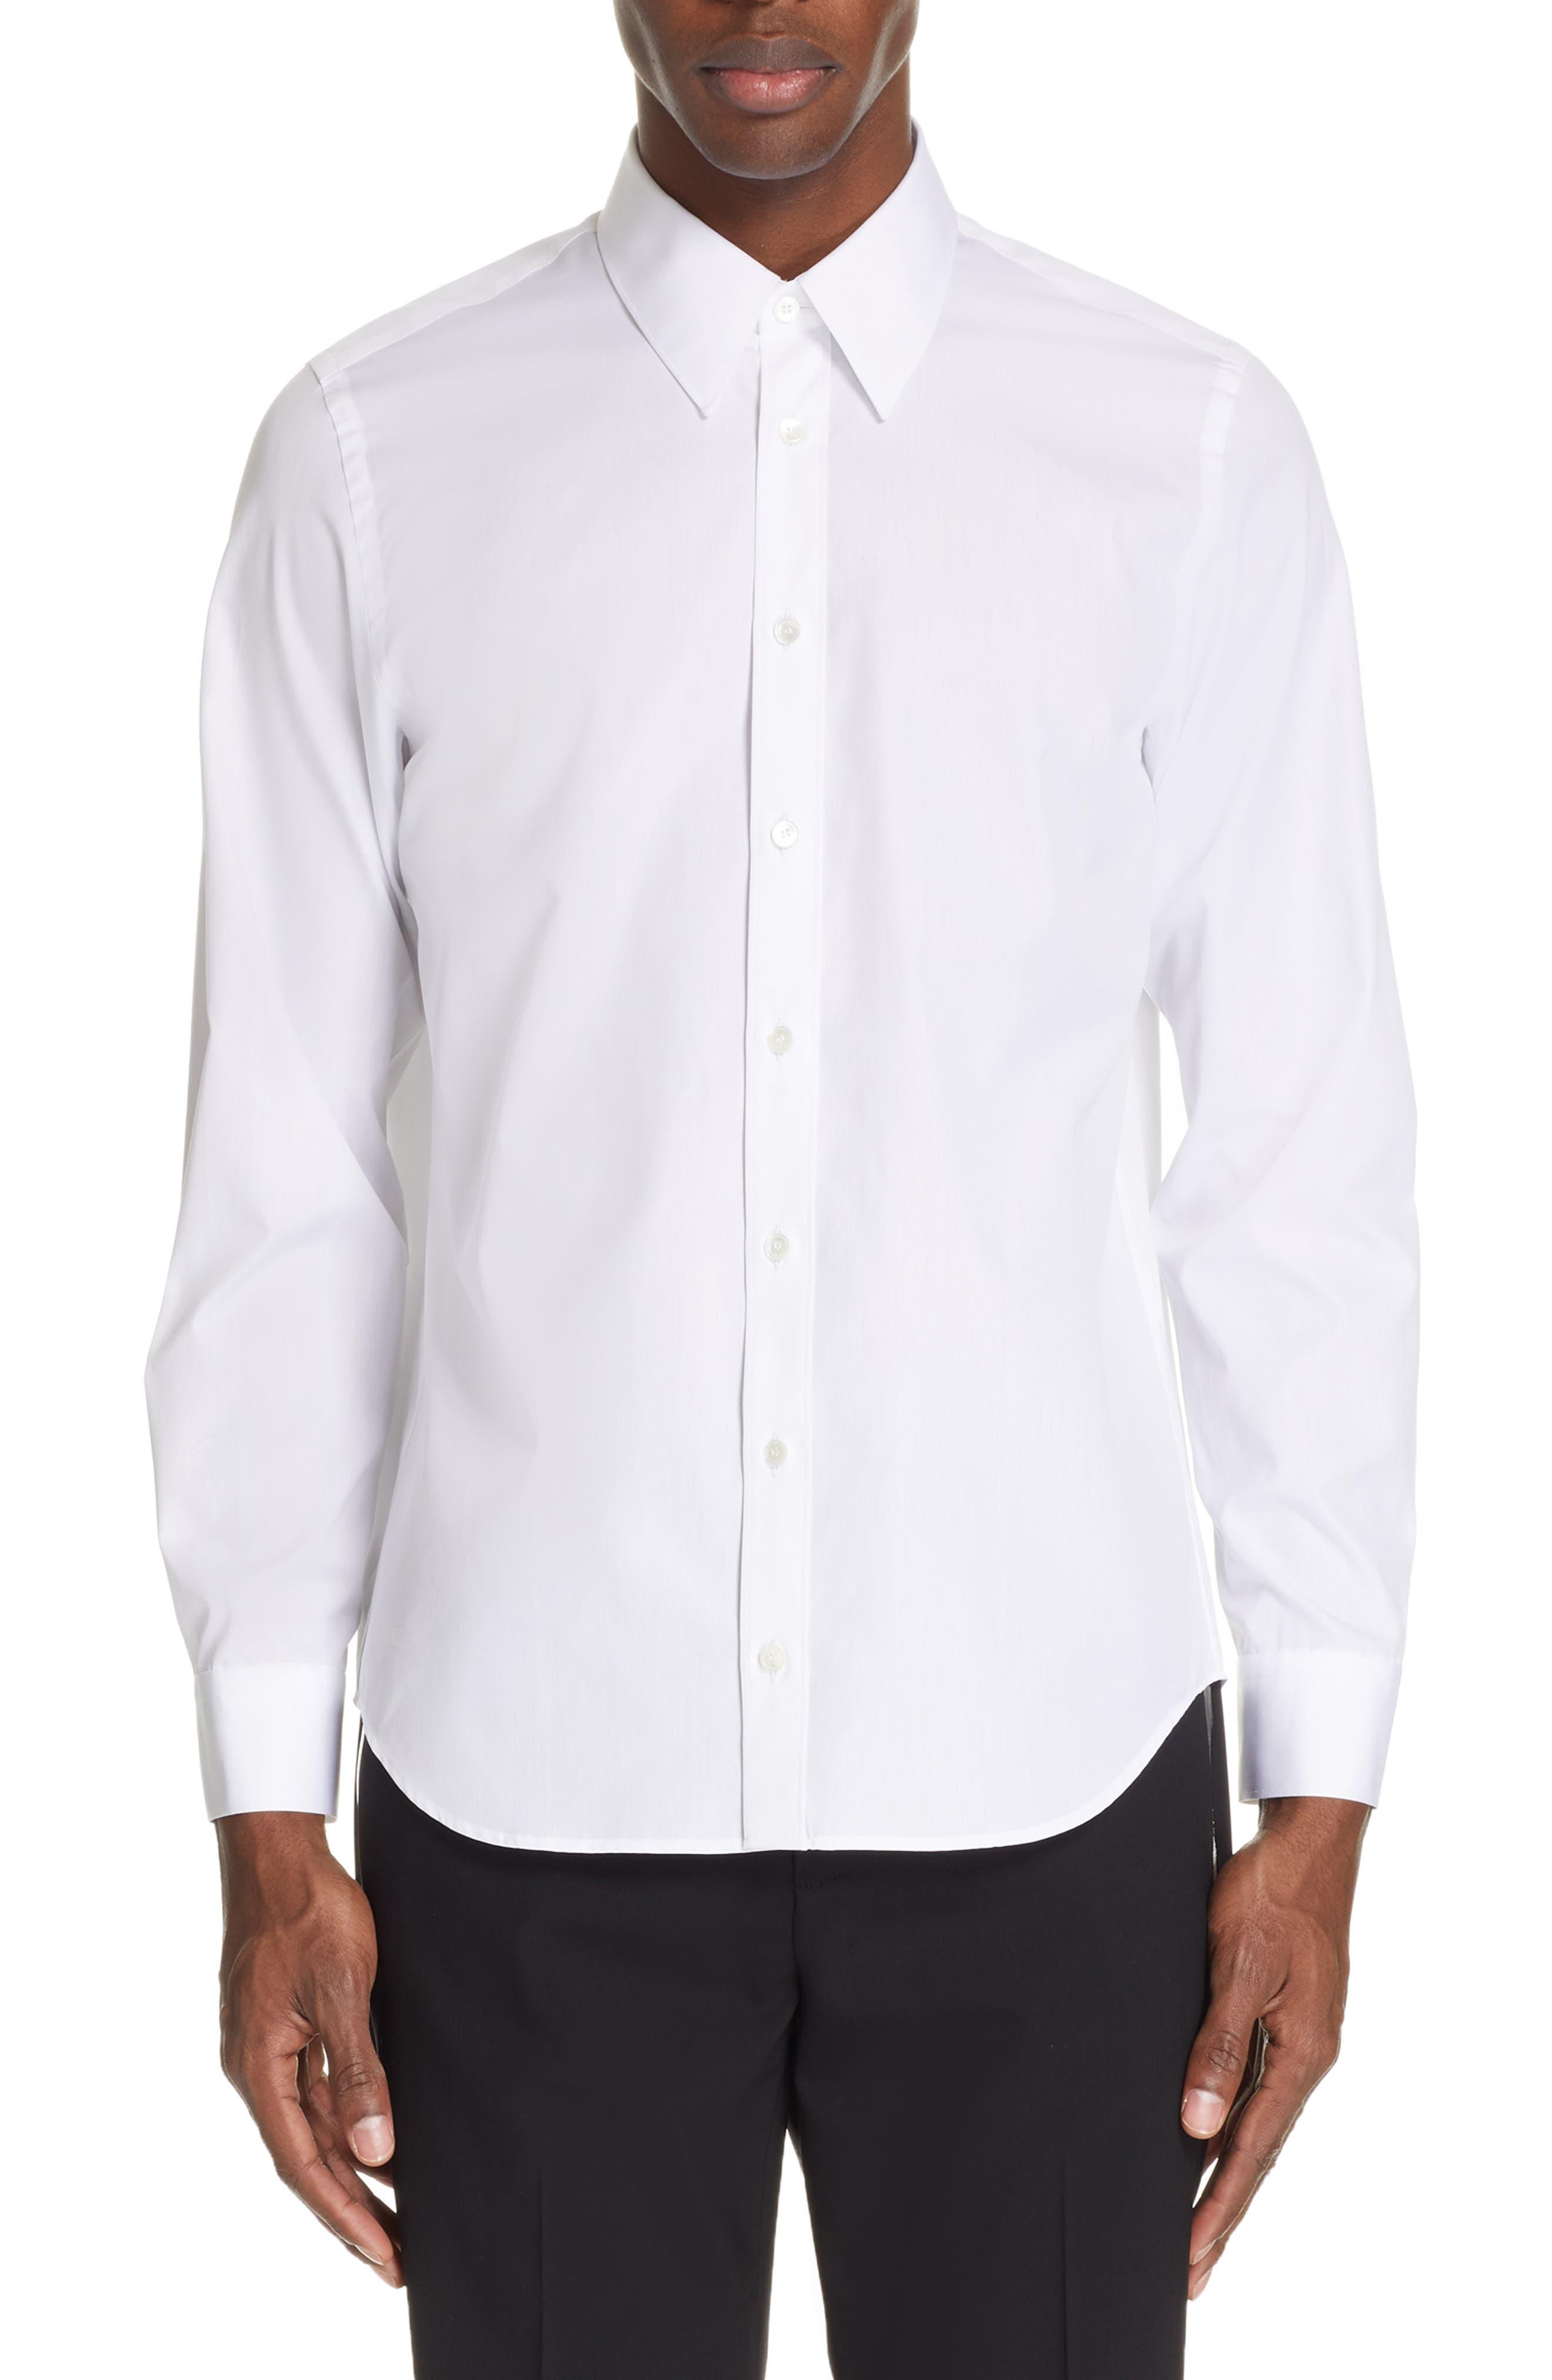 HELMUT LANG Logo Back Long Sleeve Woven Shirt, Main, color, WHITE AND BLACK